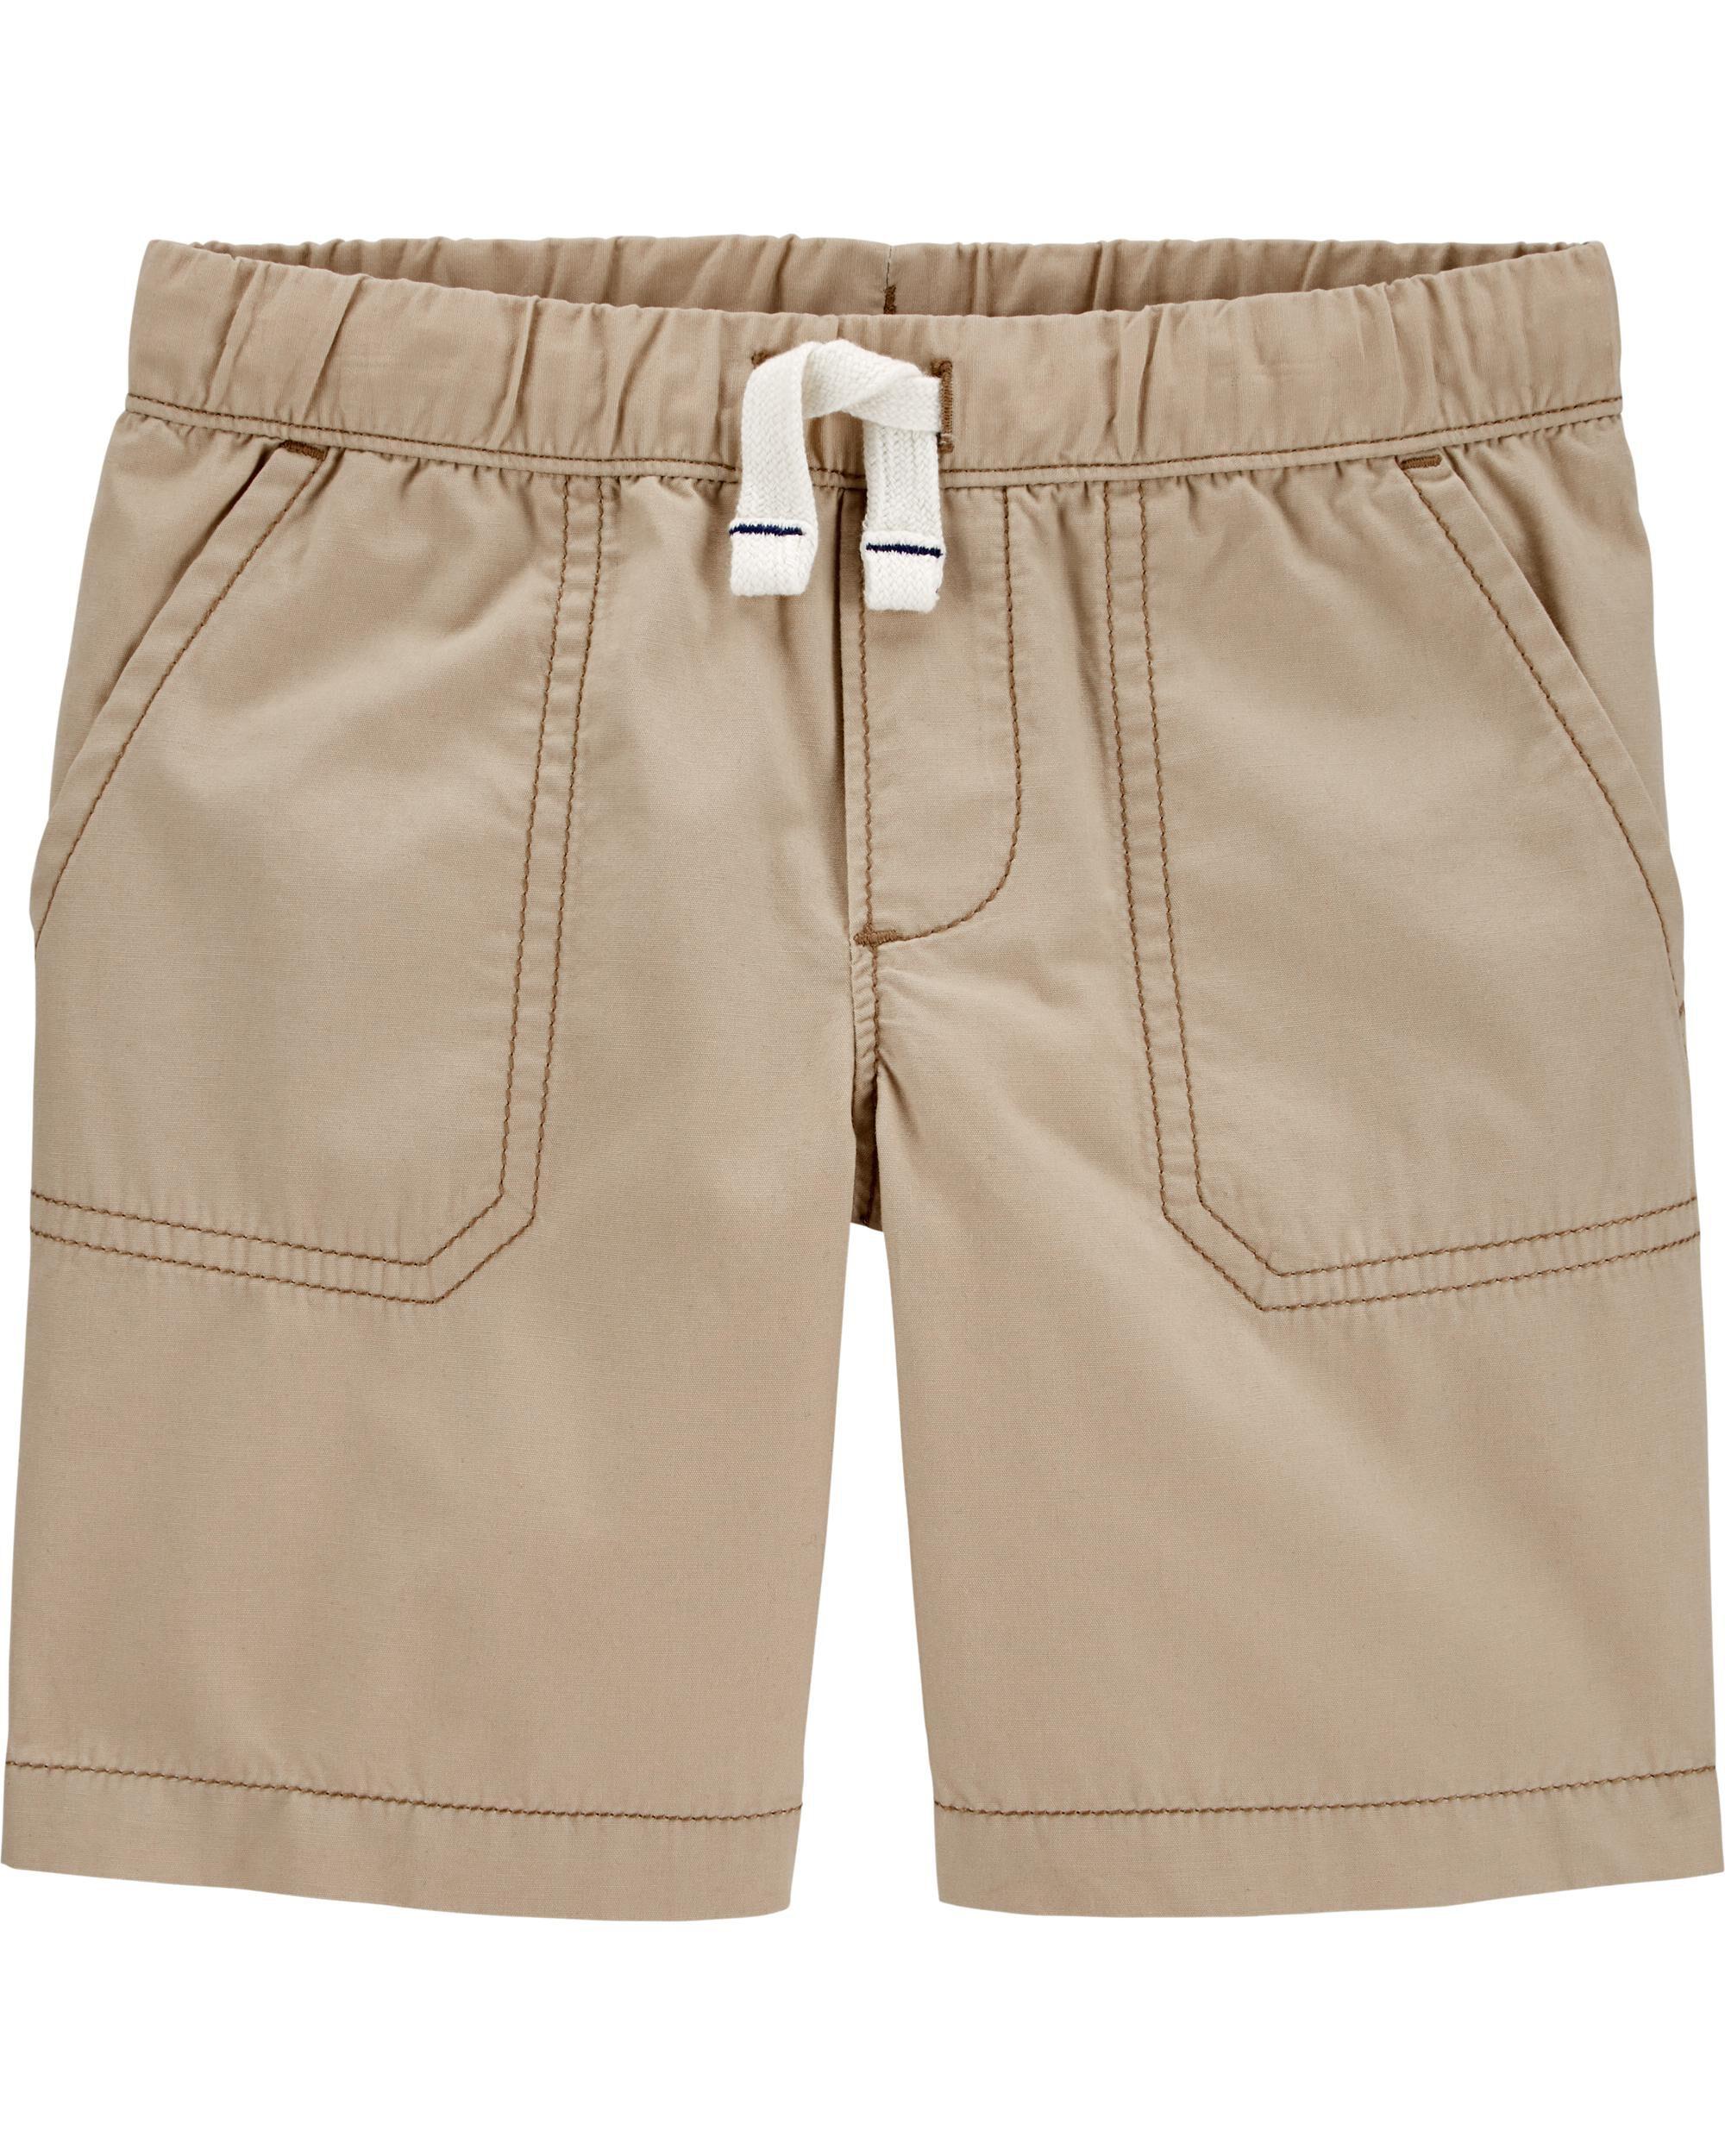 Lot of 3 Toddler Carter's Boy Cargo Shorts Camouflage//Khaki Tan//Gray Sz 4T